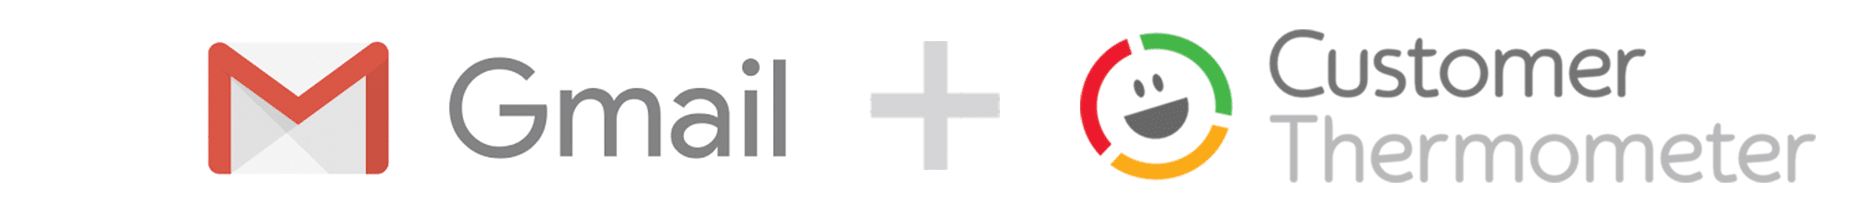 gmail customer thermometer integration logo